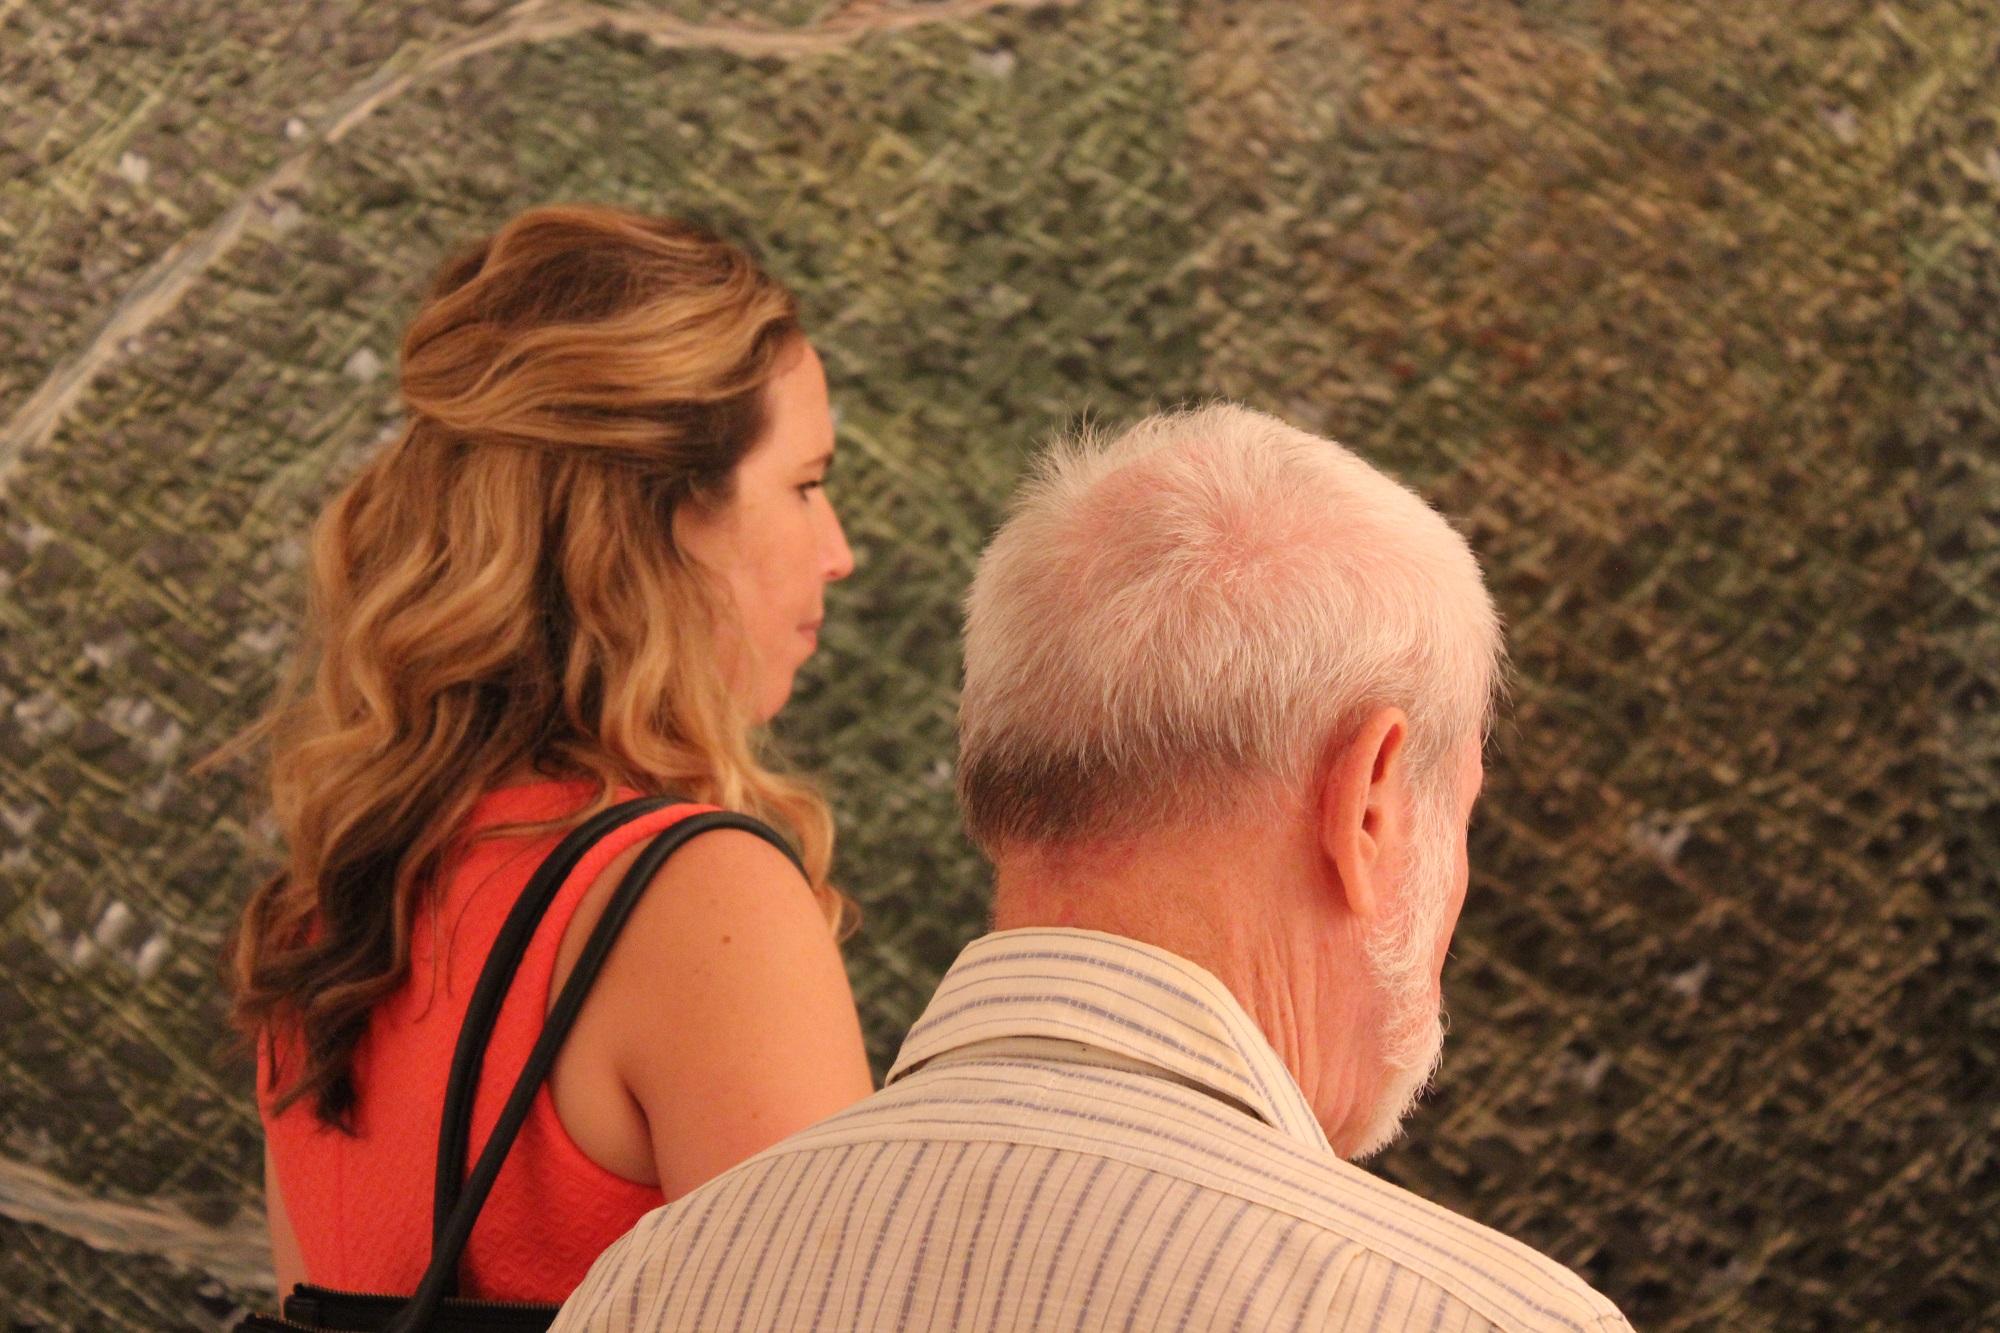 Frank Schroeder Bill Lowe Gallery Opening 24.JPG